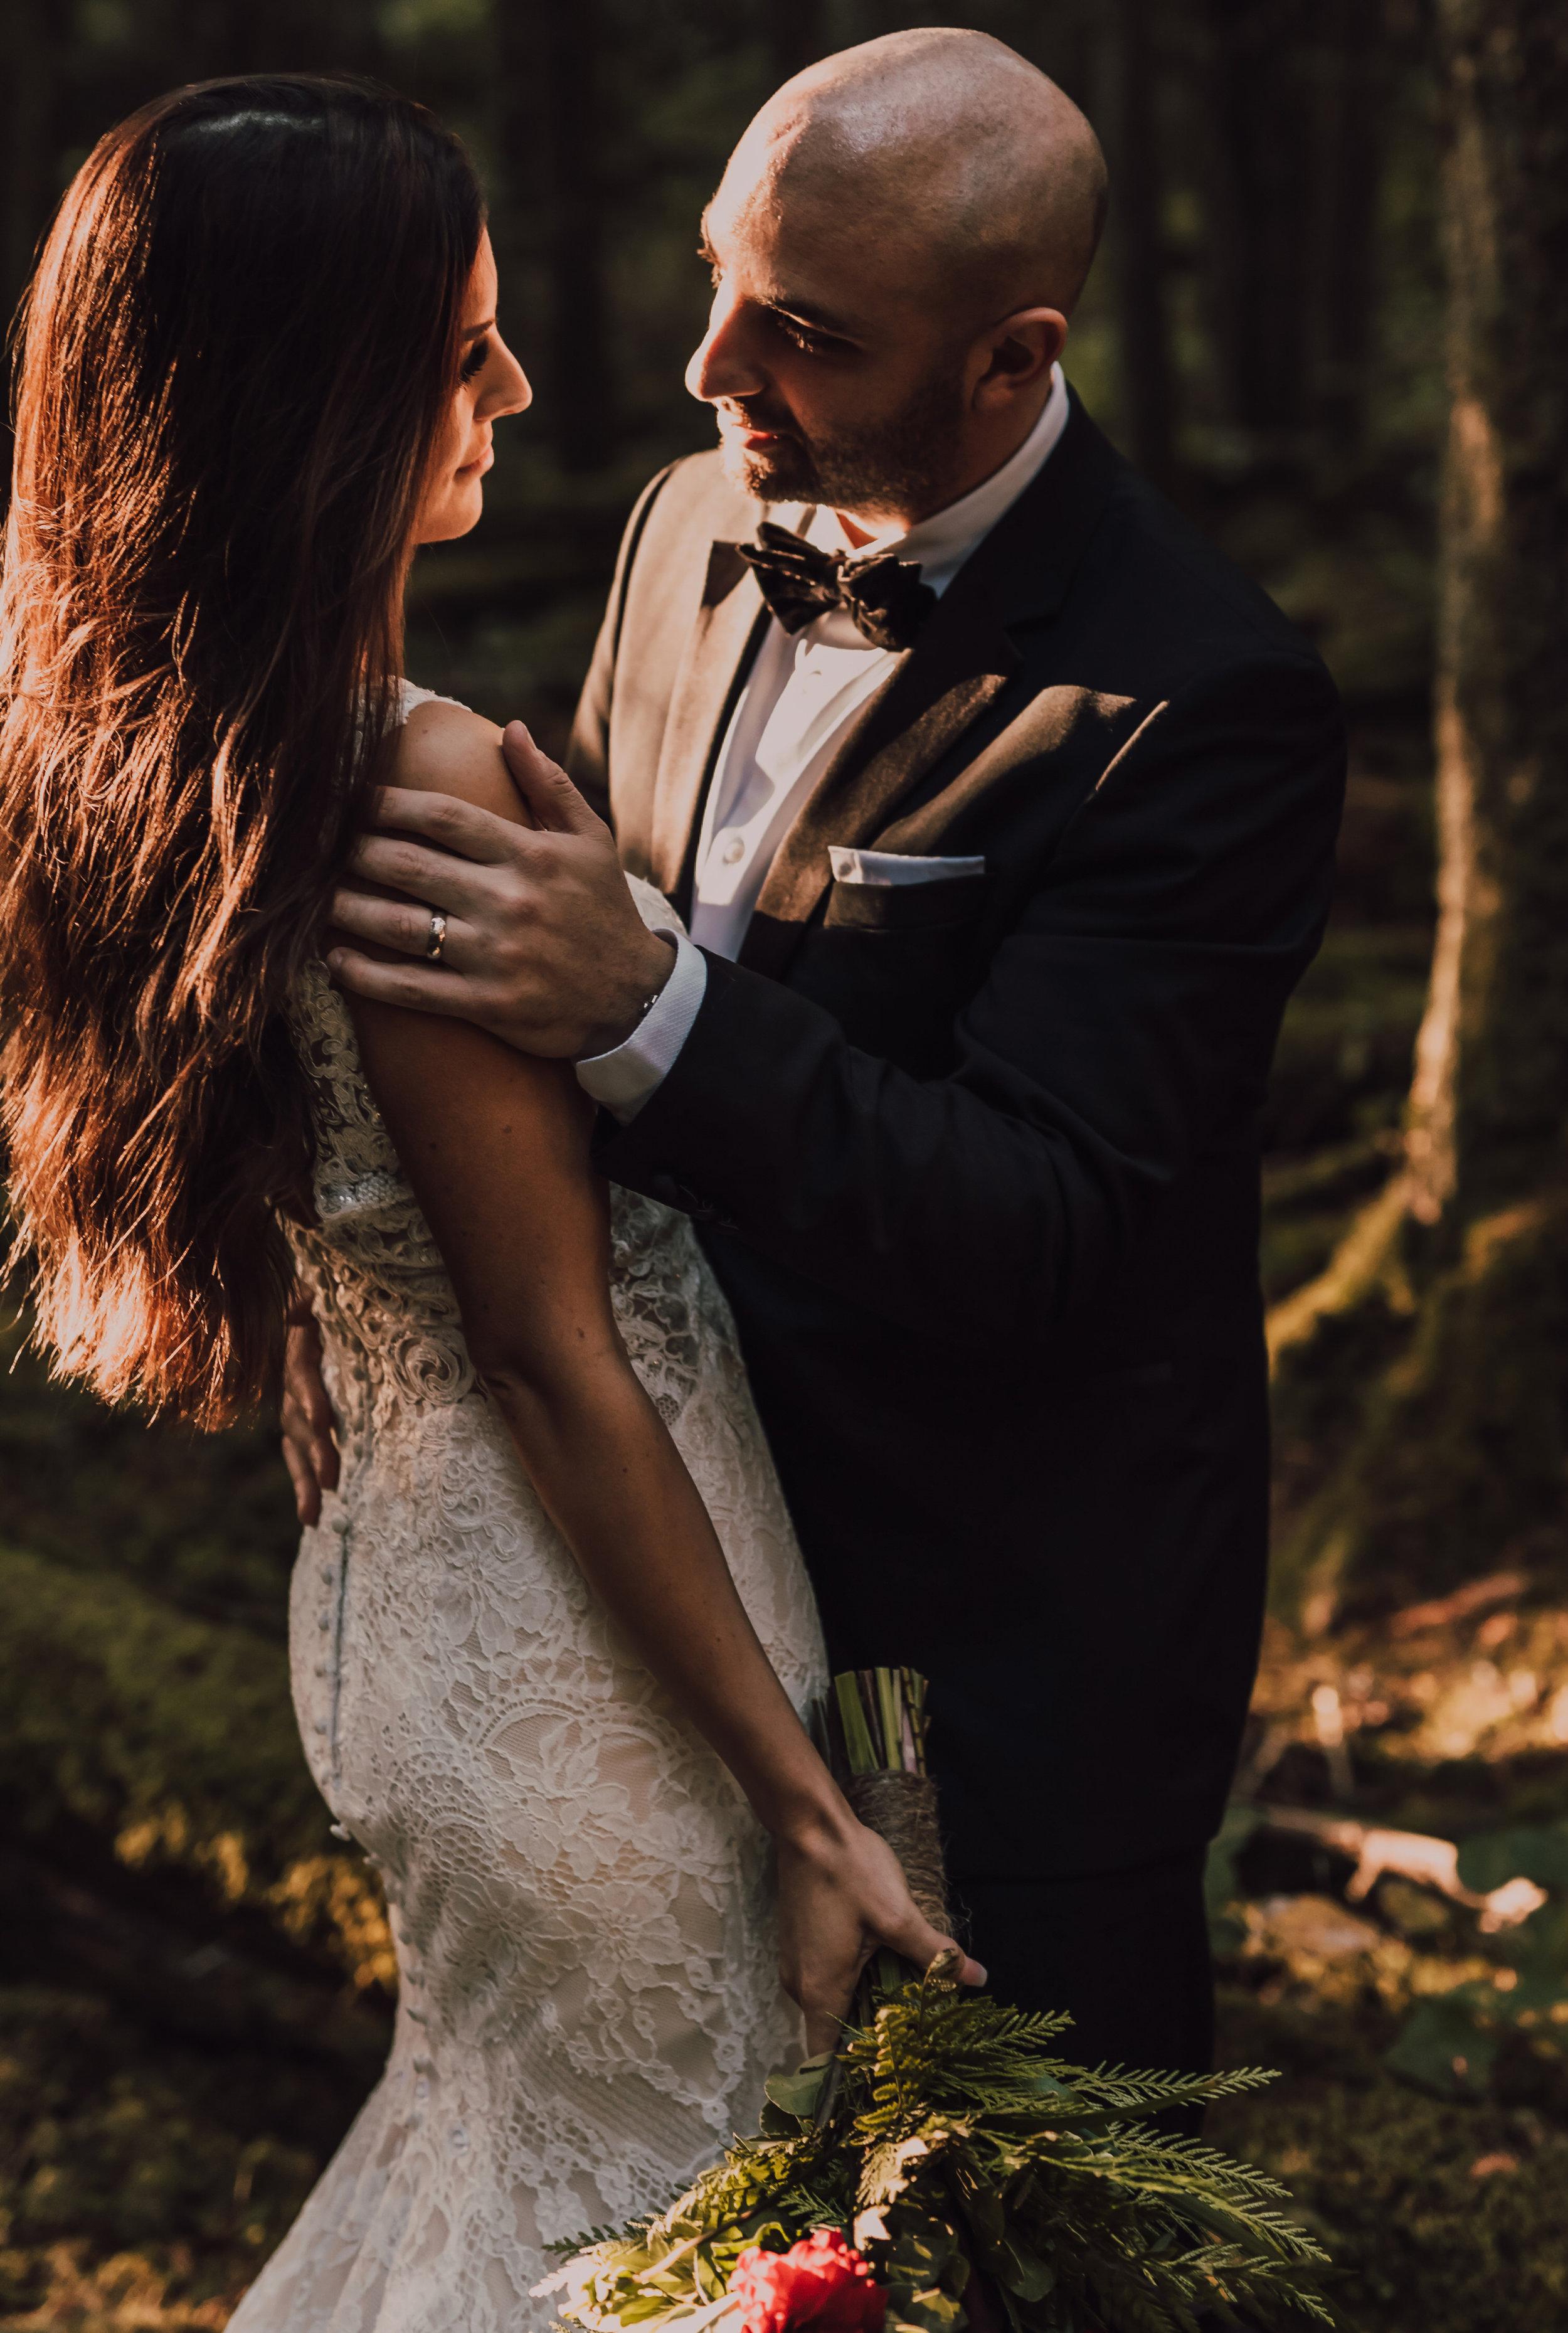 Day After Wedding Photos - Sunshine Coast Wedding Photos - Sunset Wedding Photos - Vancouver Wedding Photographer & Videographer - Sunshine Coast Wedding Photos - Sunshine Coast Wedding Photographer - Jennifer Picard Photography - 1A5A8189.jpg